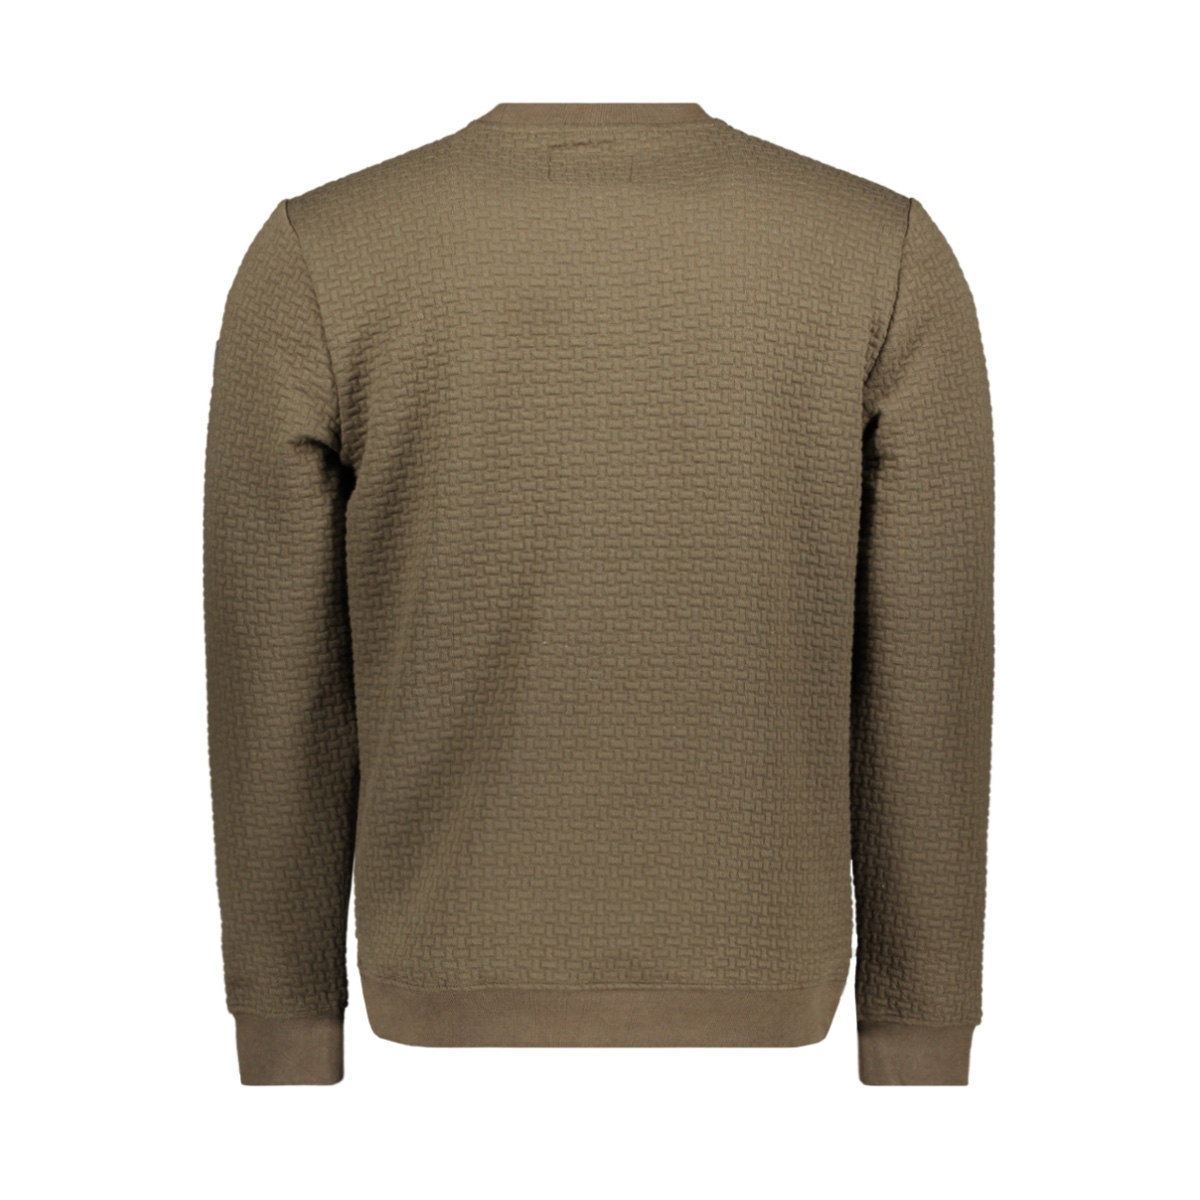 crewneck jacquard sweater 92100815 no-excess sweater 059 dk army